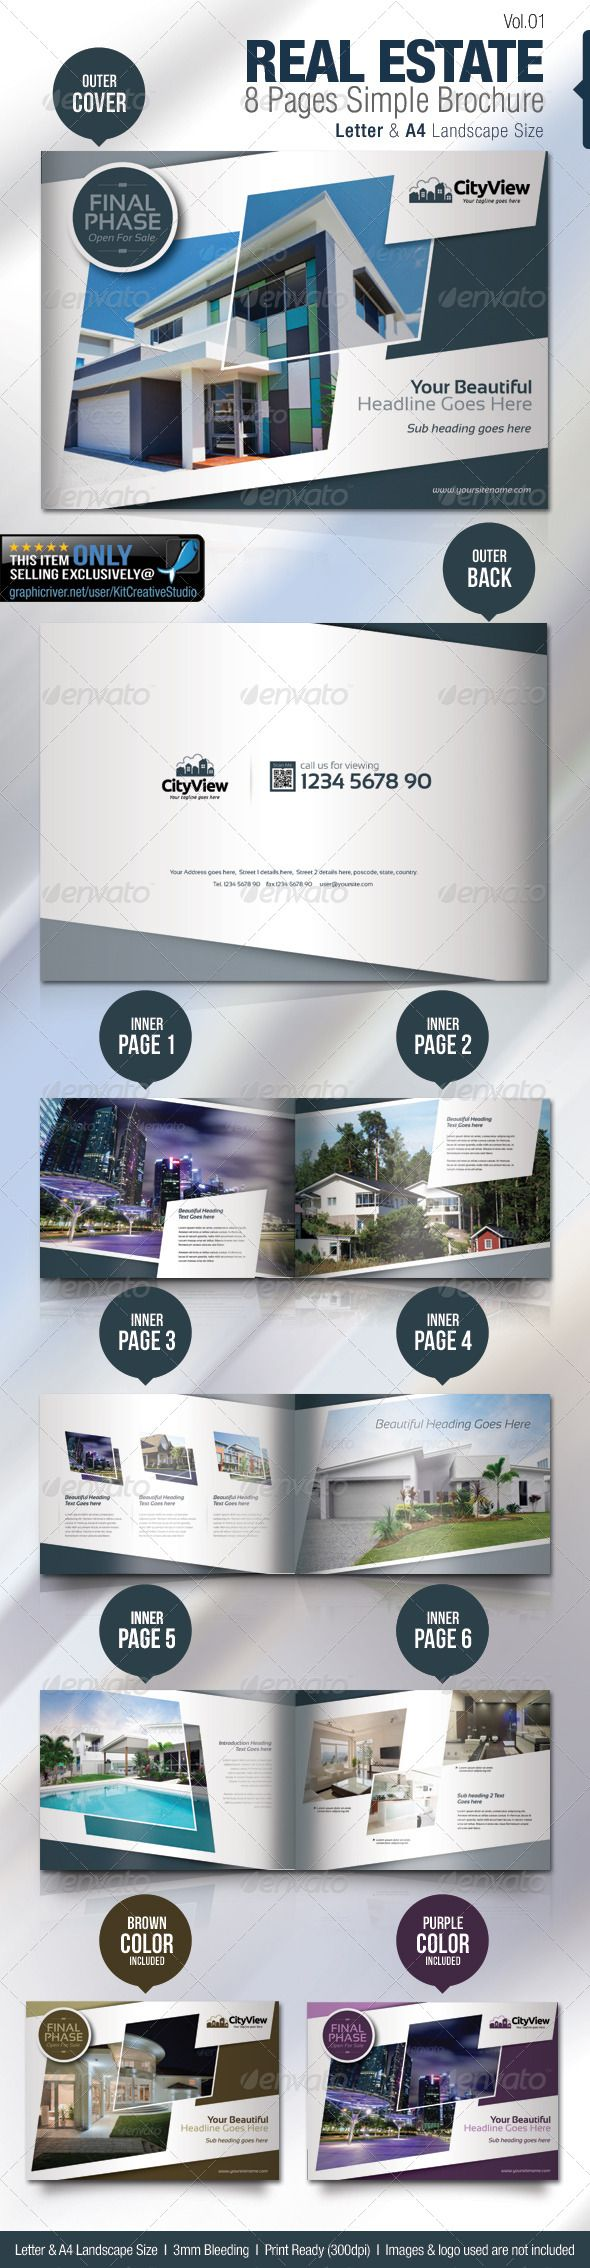 Real Estate 8 Pages Simple Brochure   Brochures, Brochure template ...